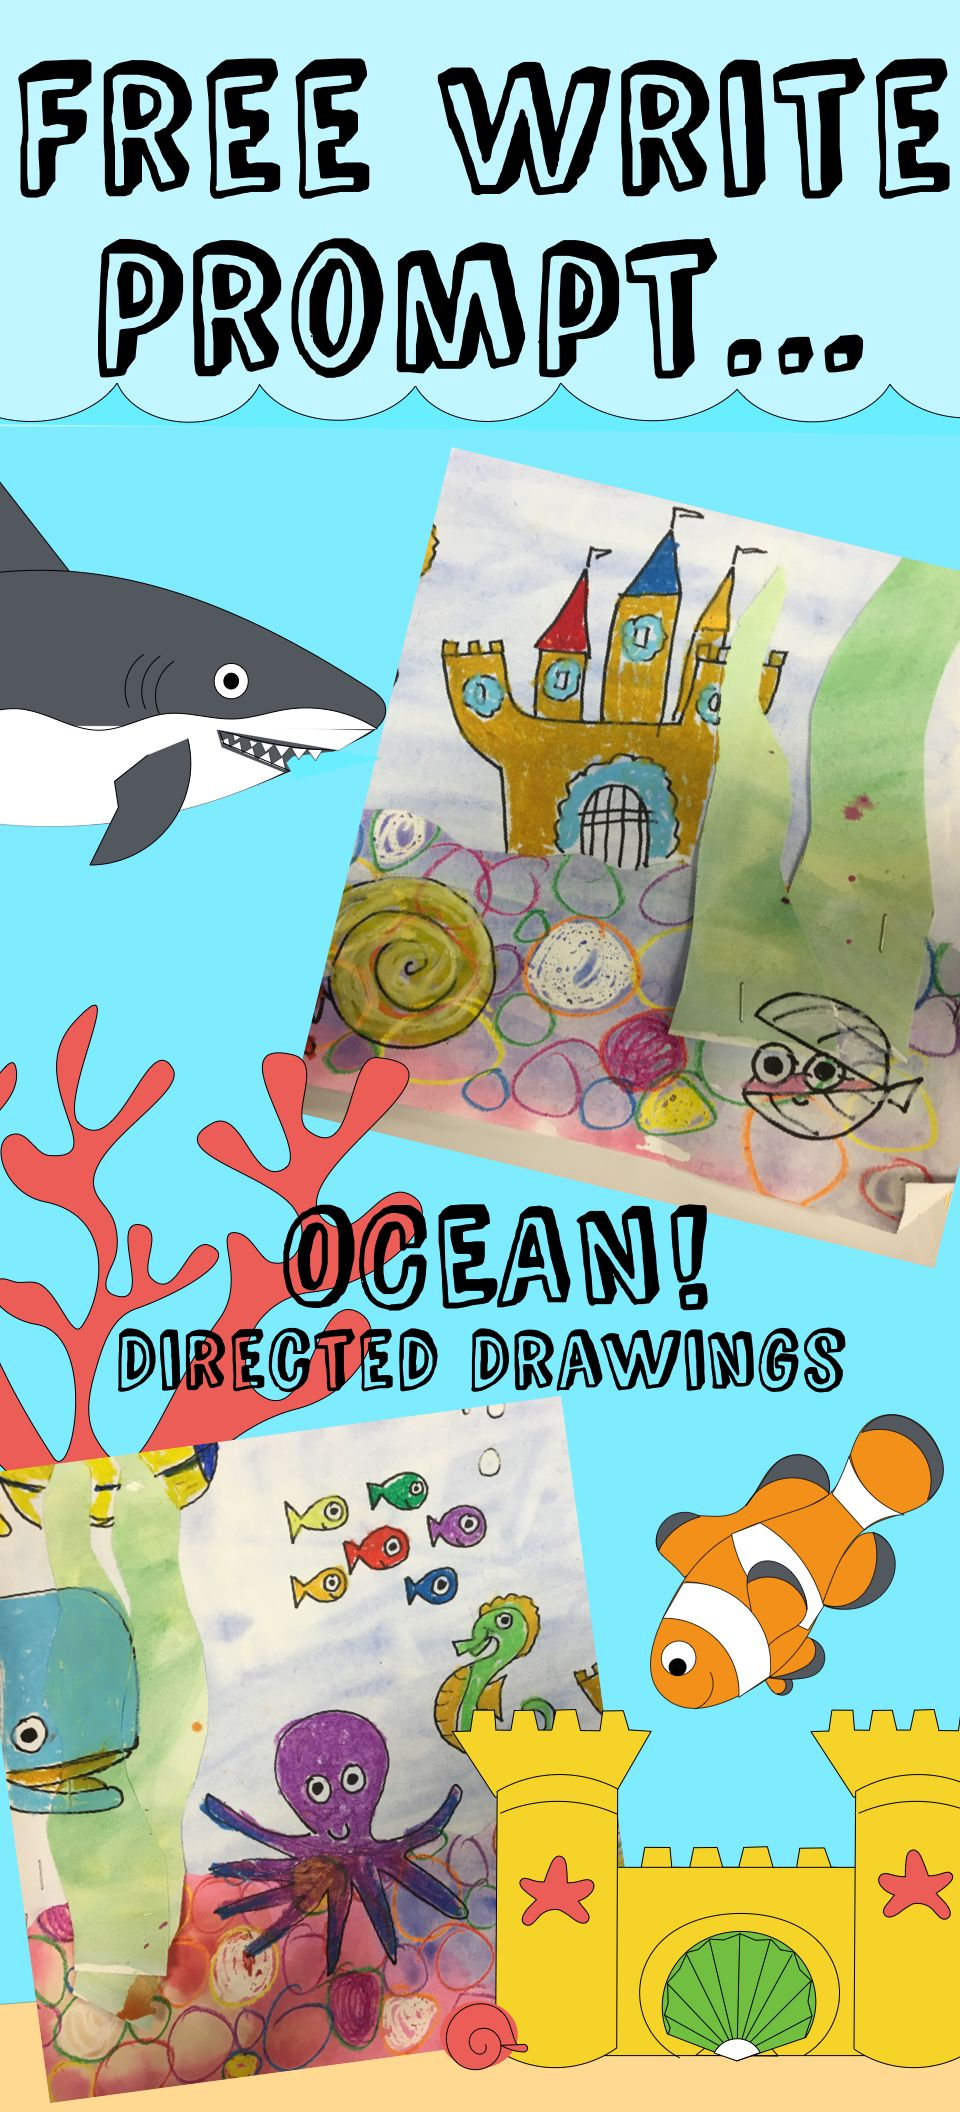 Ocean Guided Drawings Drawings, Directed drawing